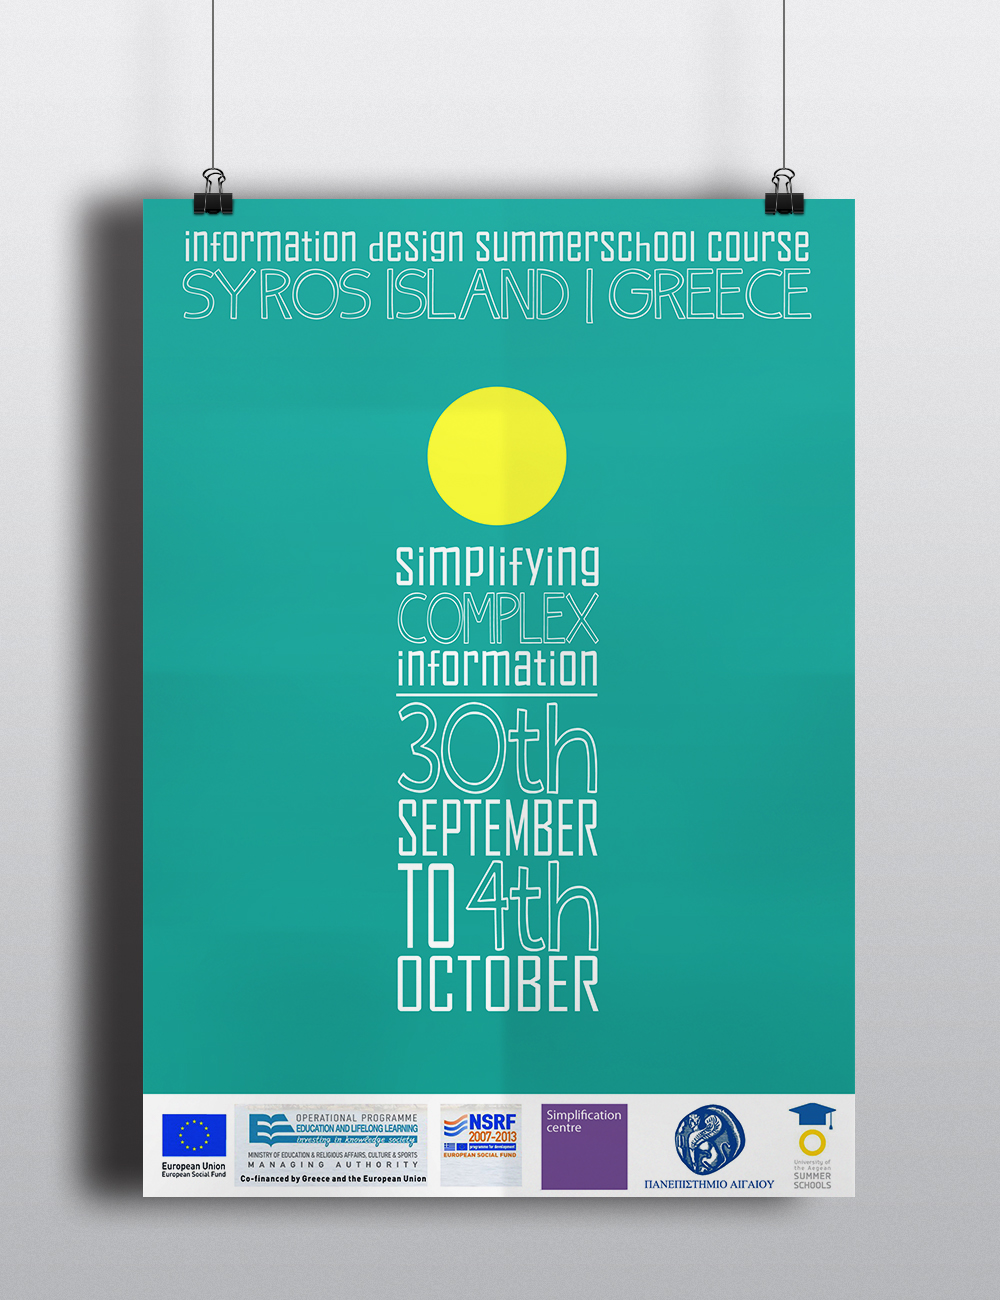 Info Design summer school on Behance